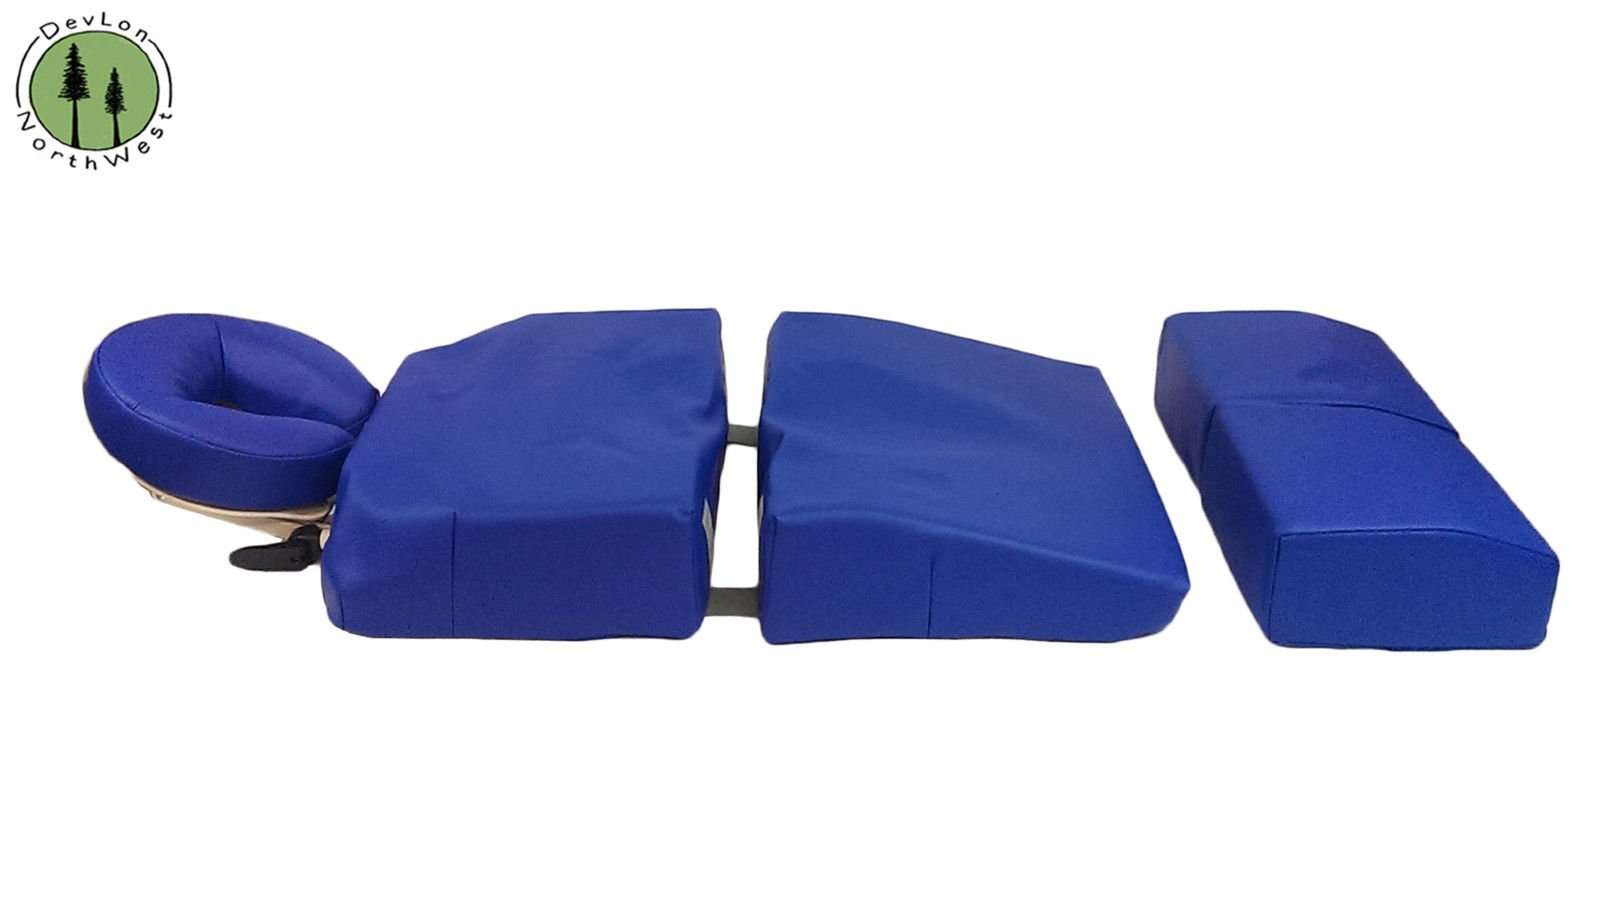 Pregnancy Pillow Massage, Pregnancy Massage Table, Pregnancy Bolster, Pregnancy Massage Bolster, Pregnancy Massage Pillow w/ Carrying Case